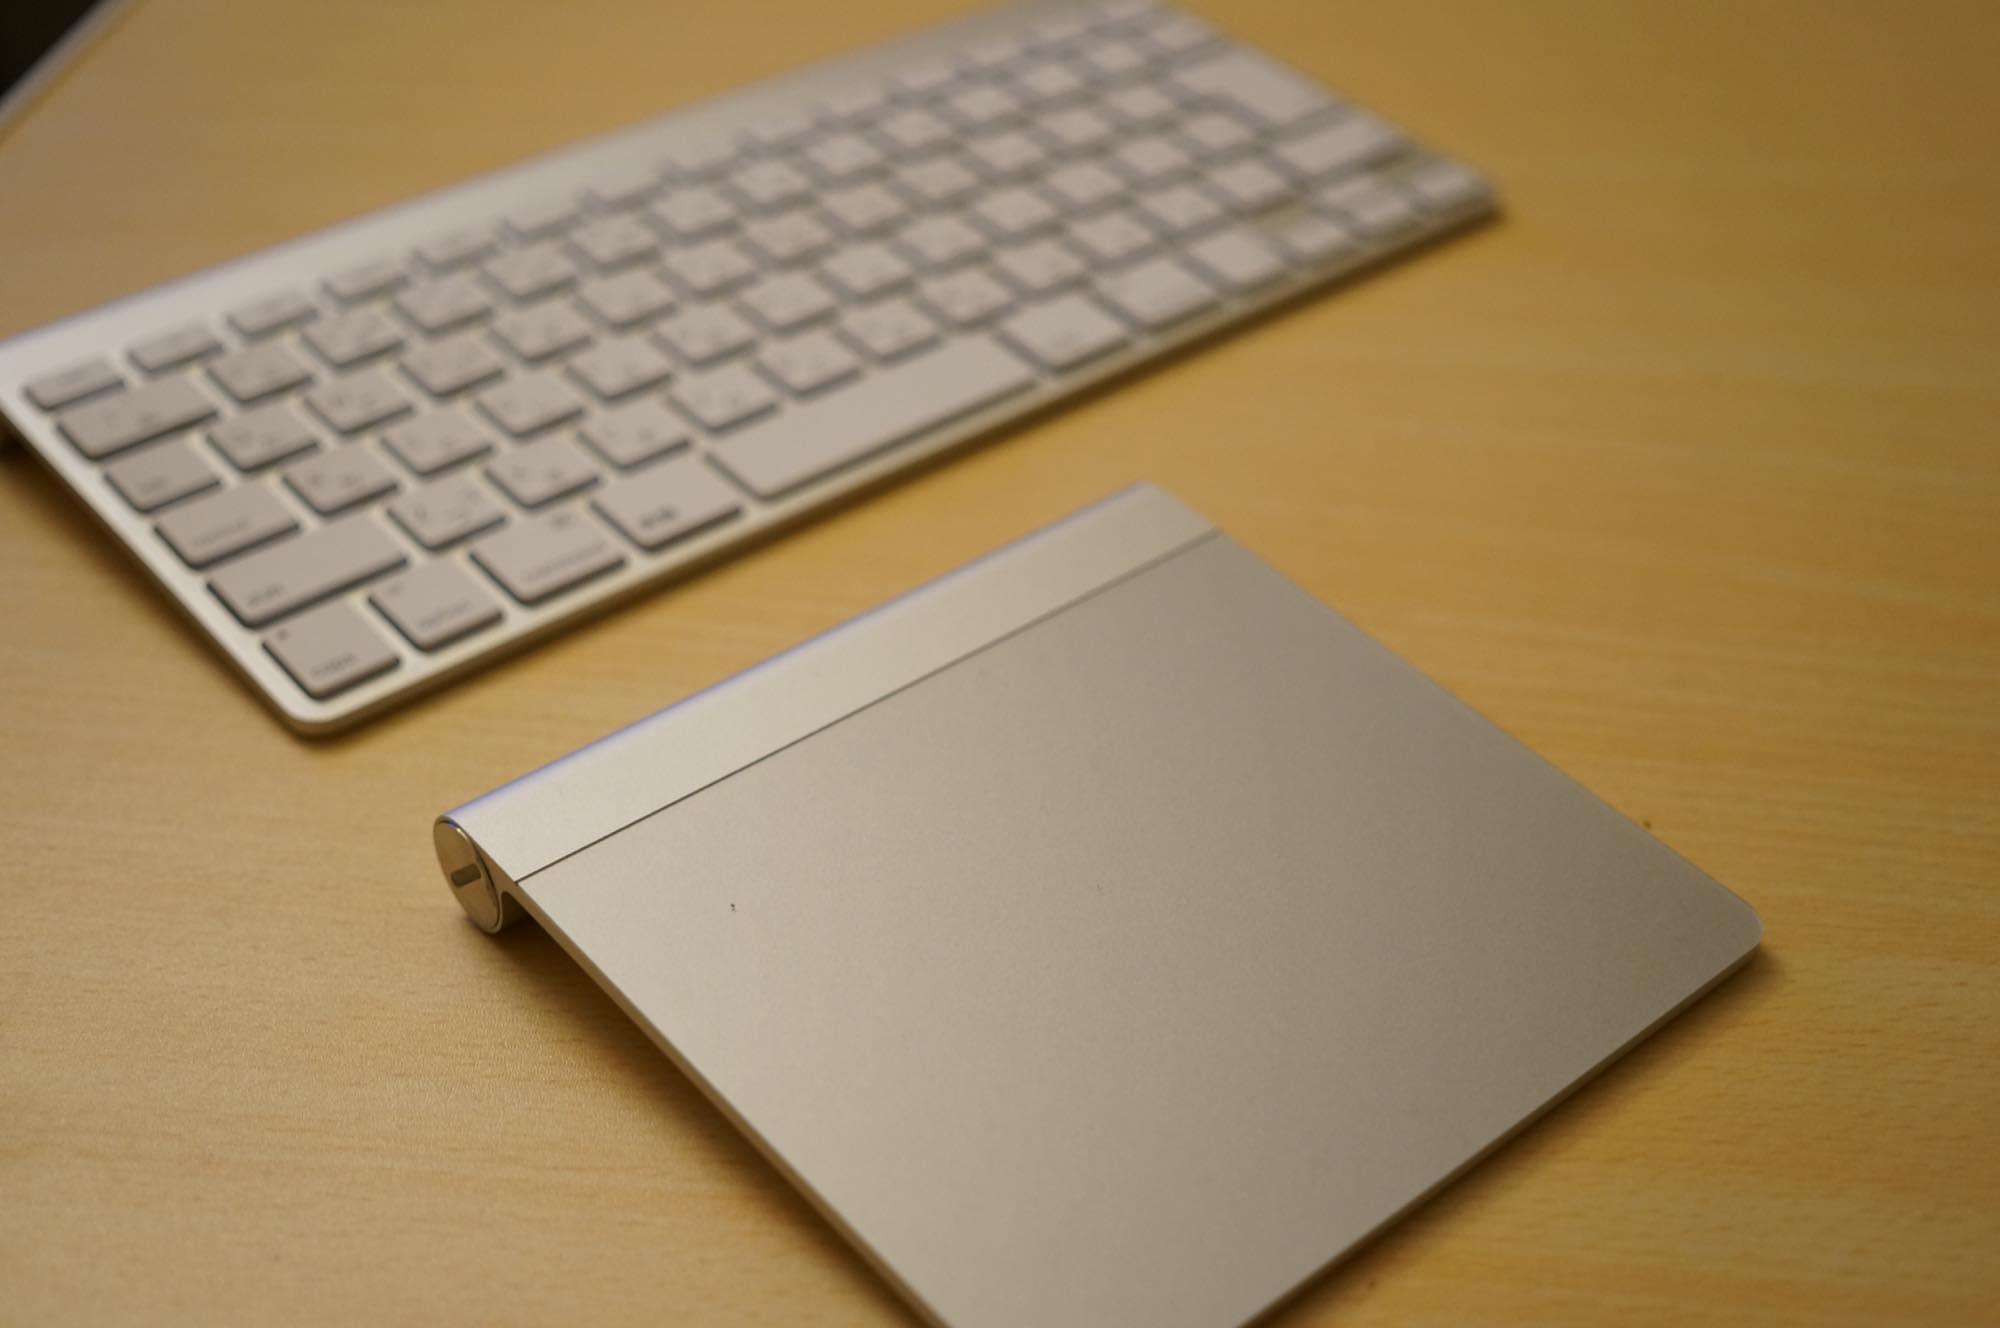 Magic-TrackPad9